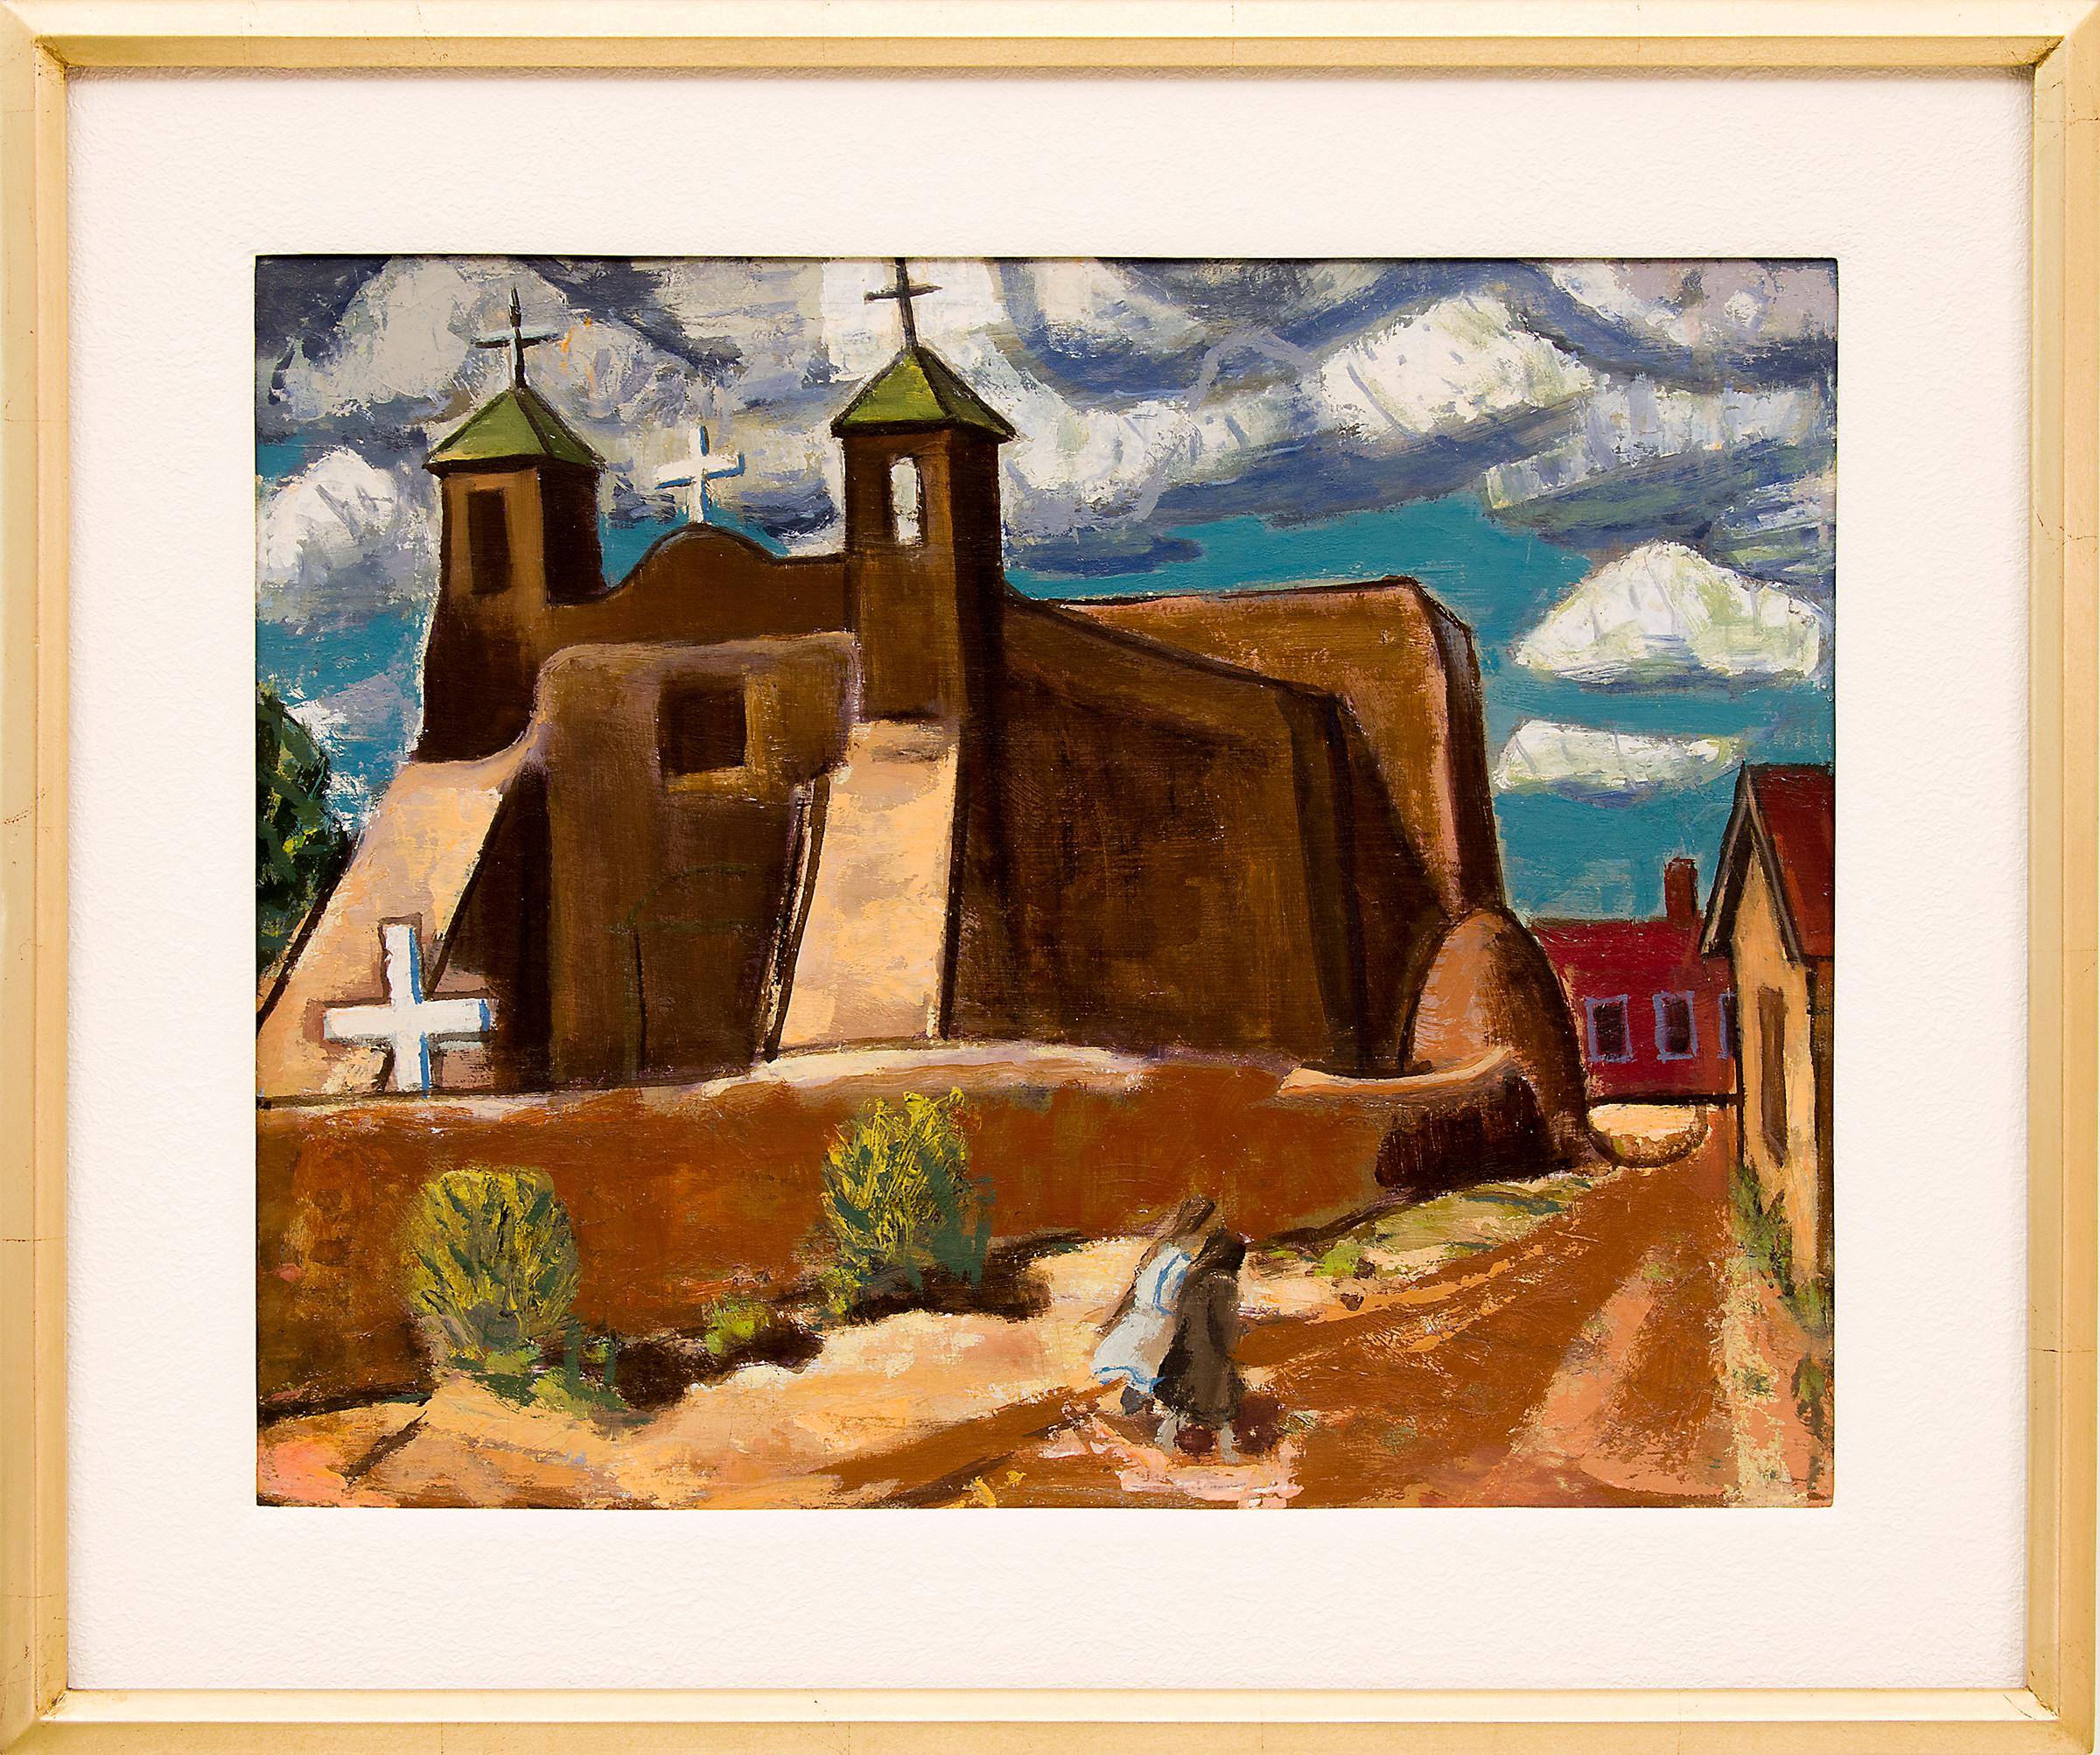 Untitled (Adobe Church, New Mexico, Original Modernist Landscape, circa 1940)